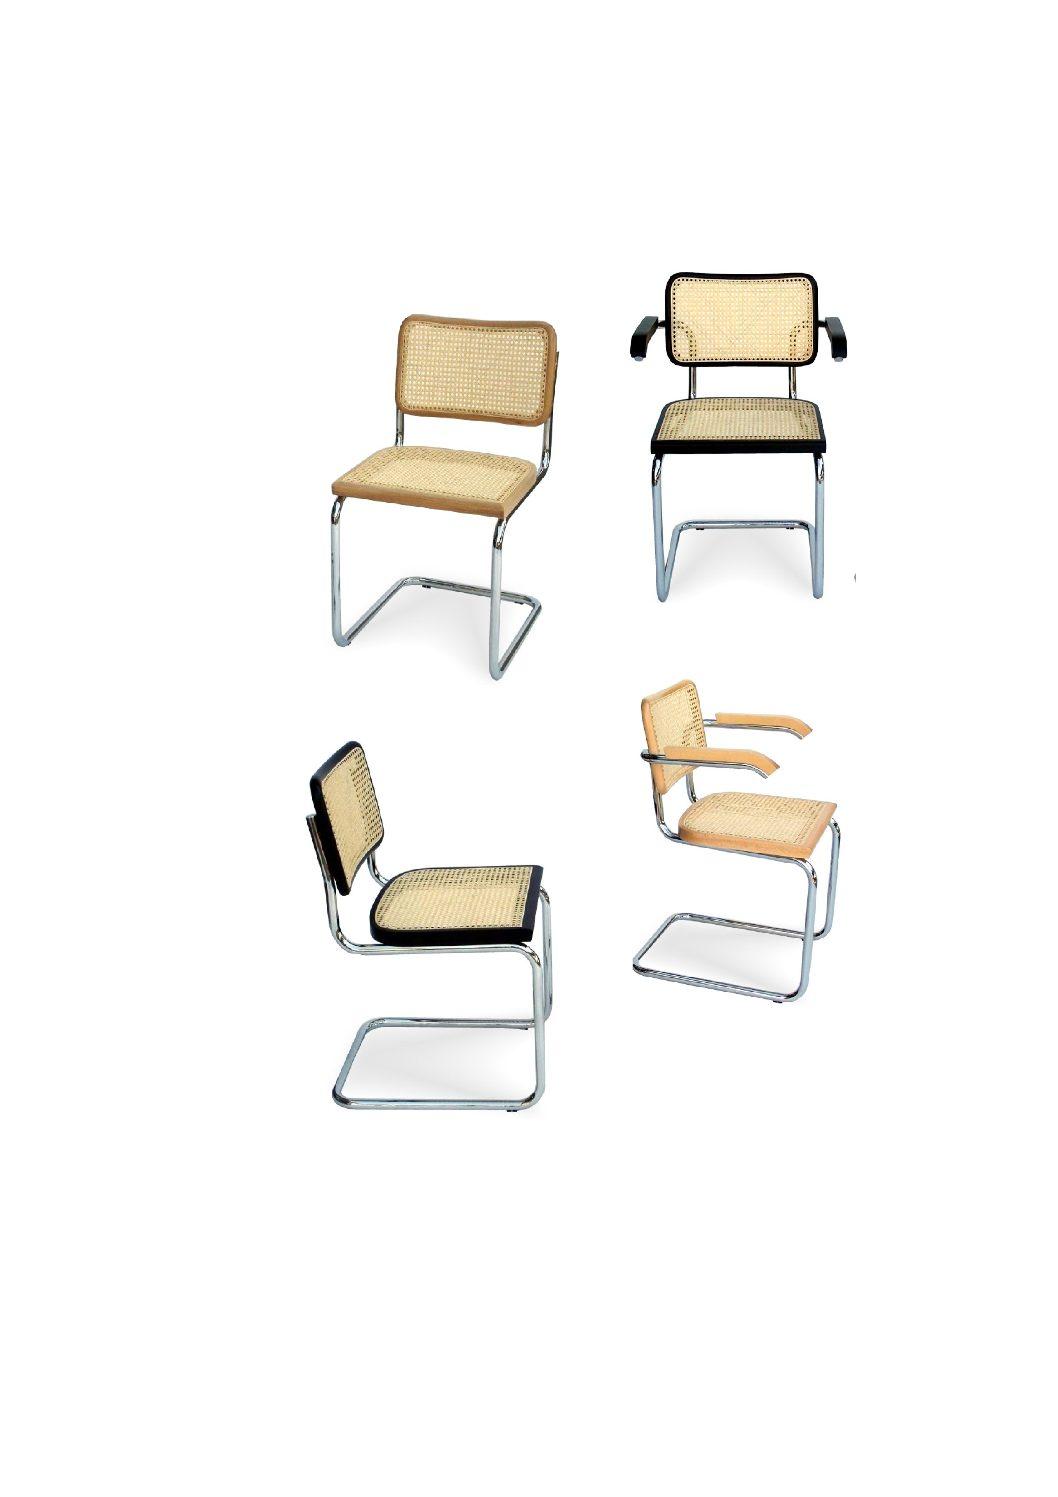 Ricambi Per Sedie Cesca Arredamento Bauhaus